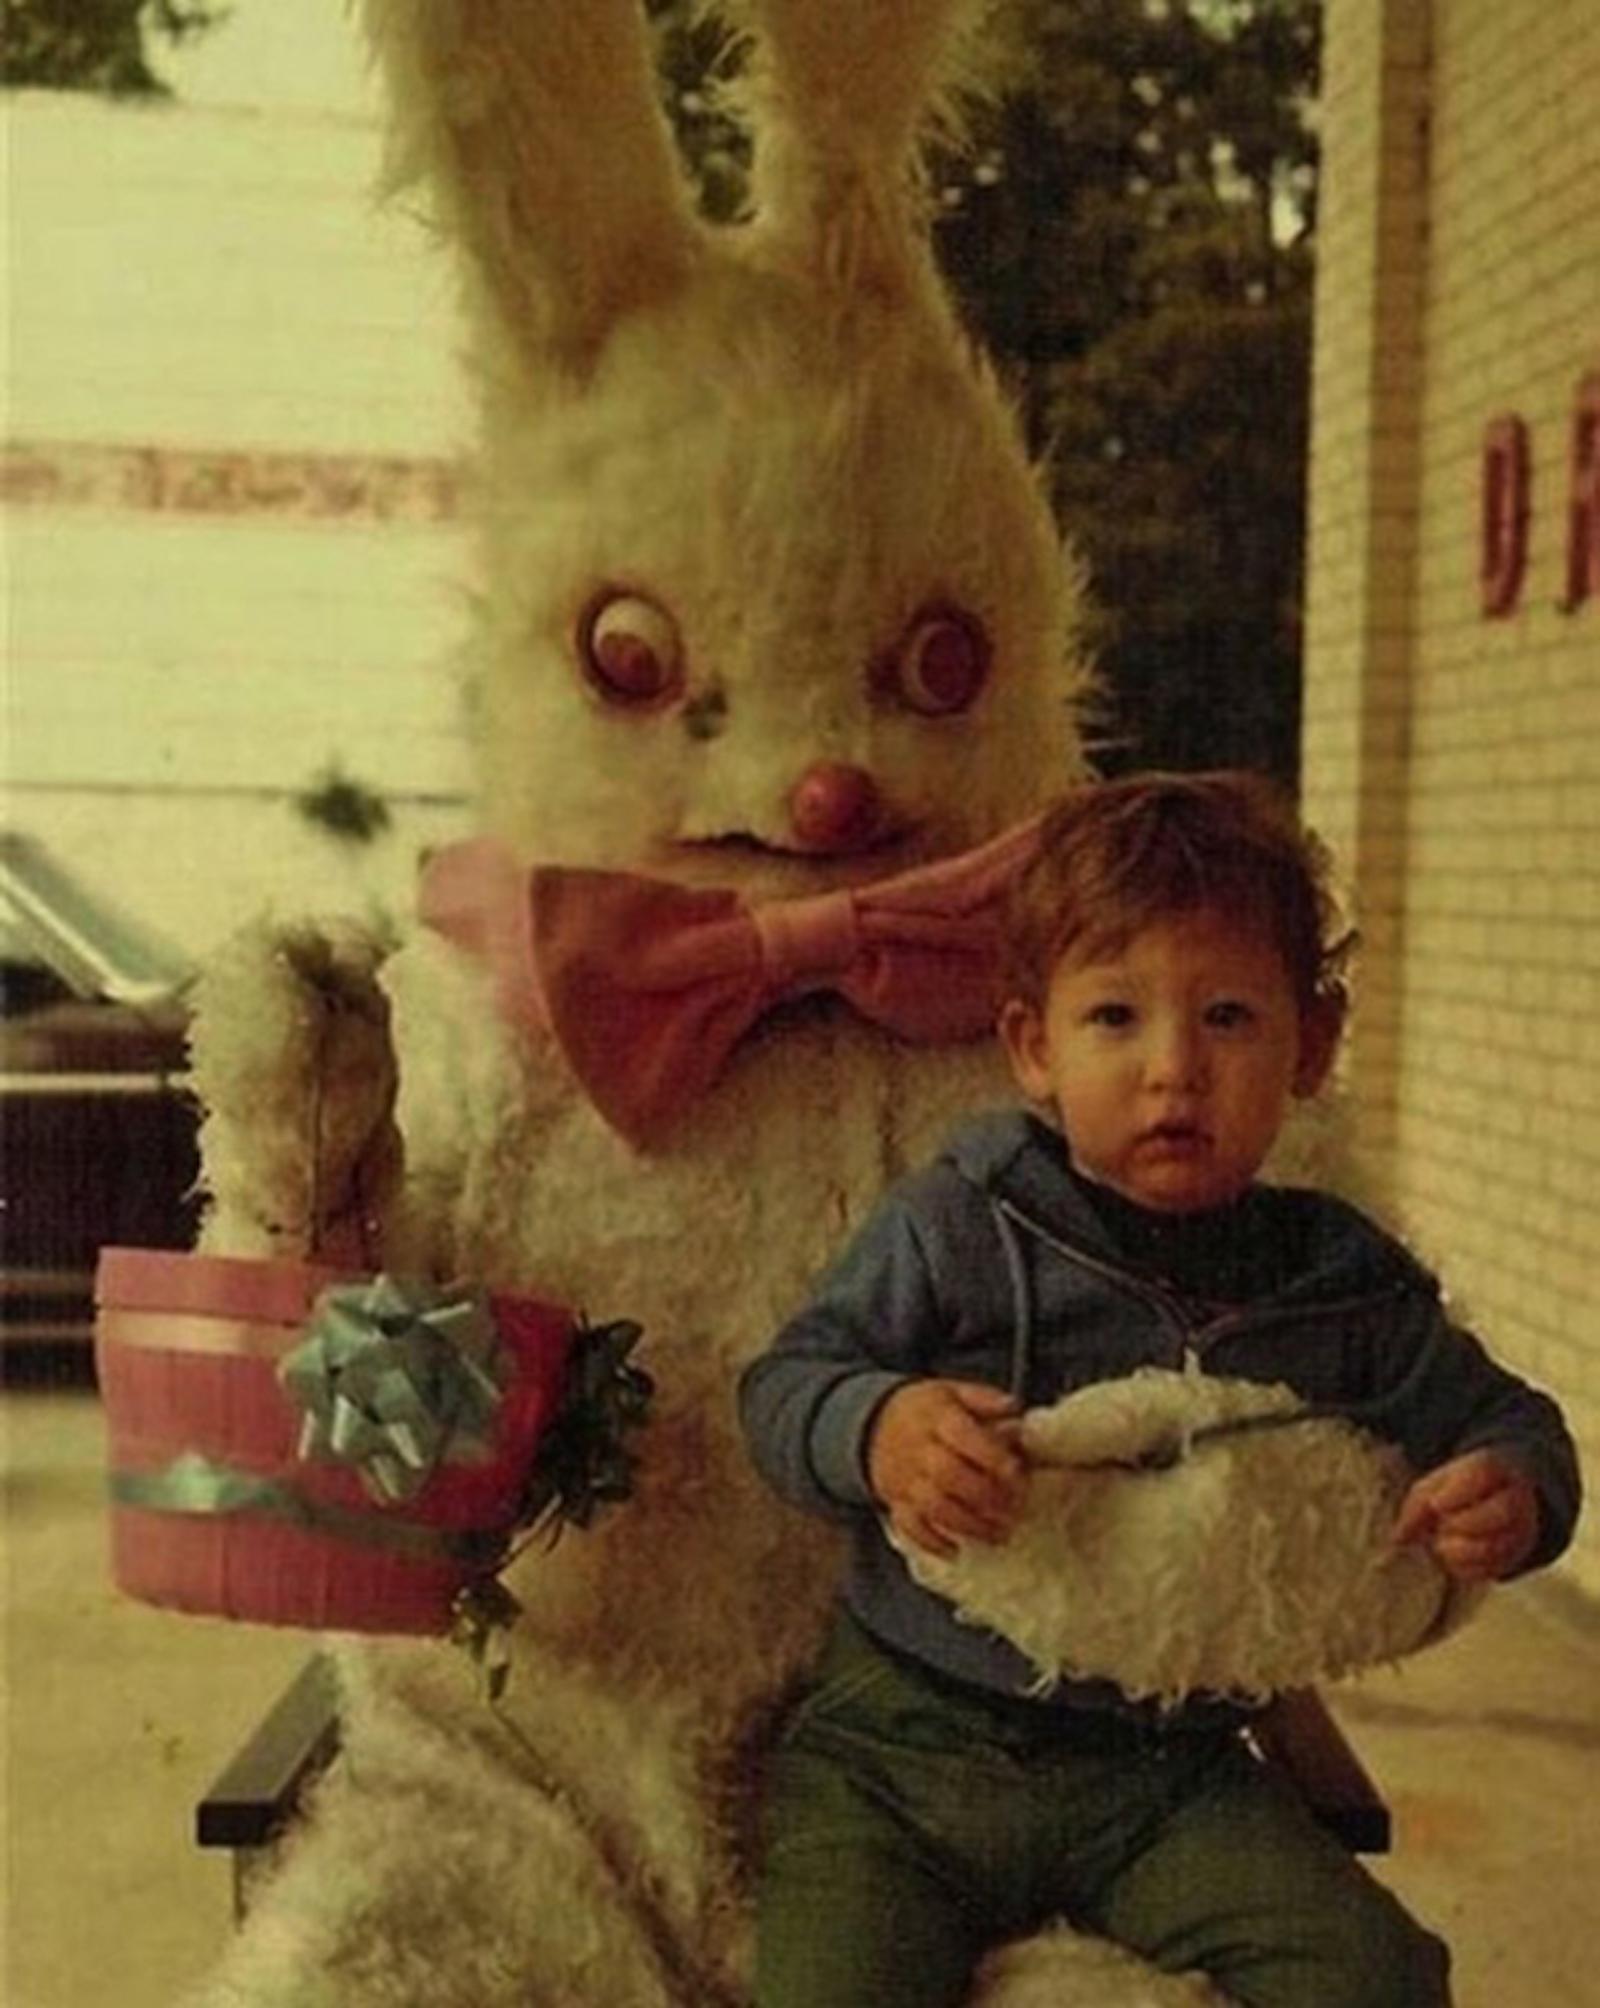 Bilderesultat for scariest pictures ever taken